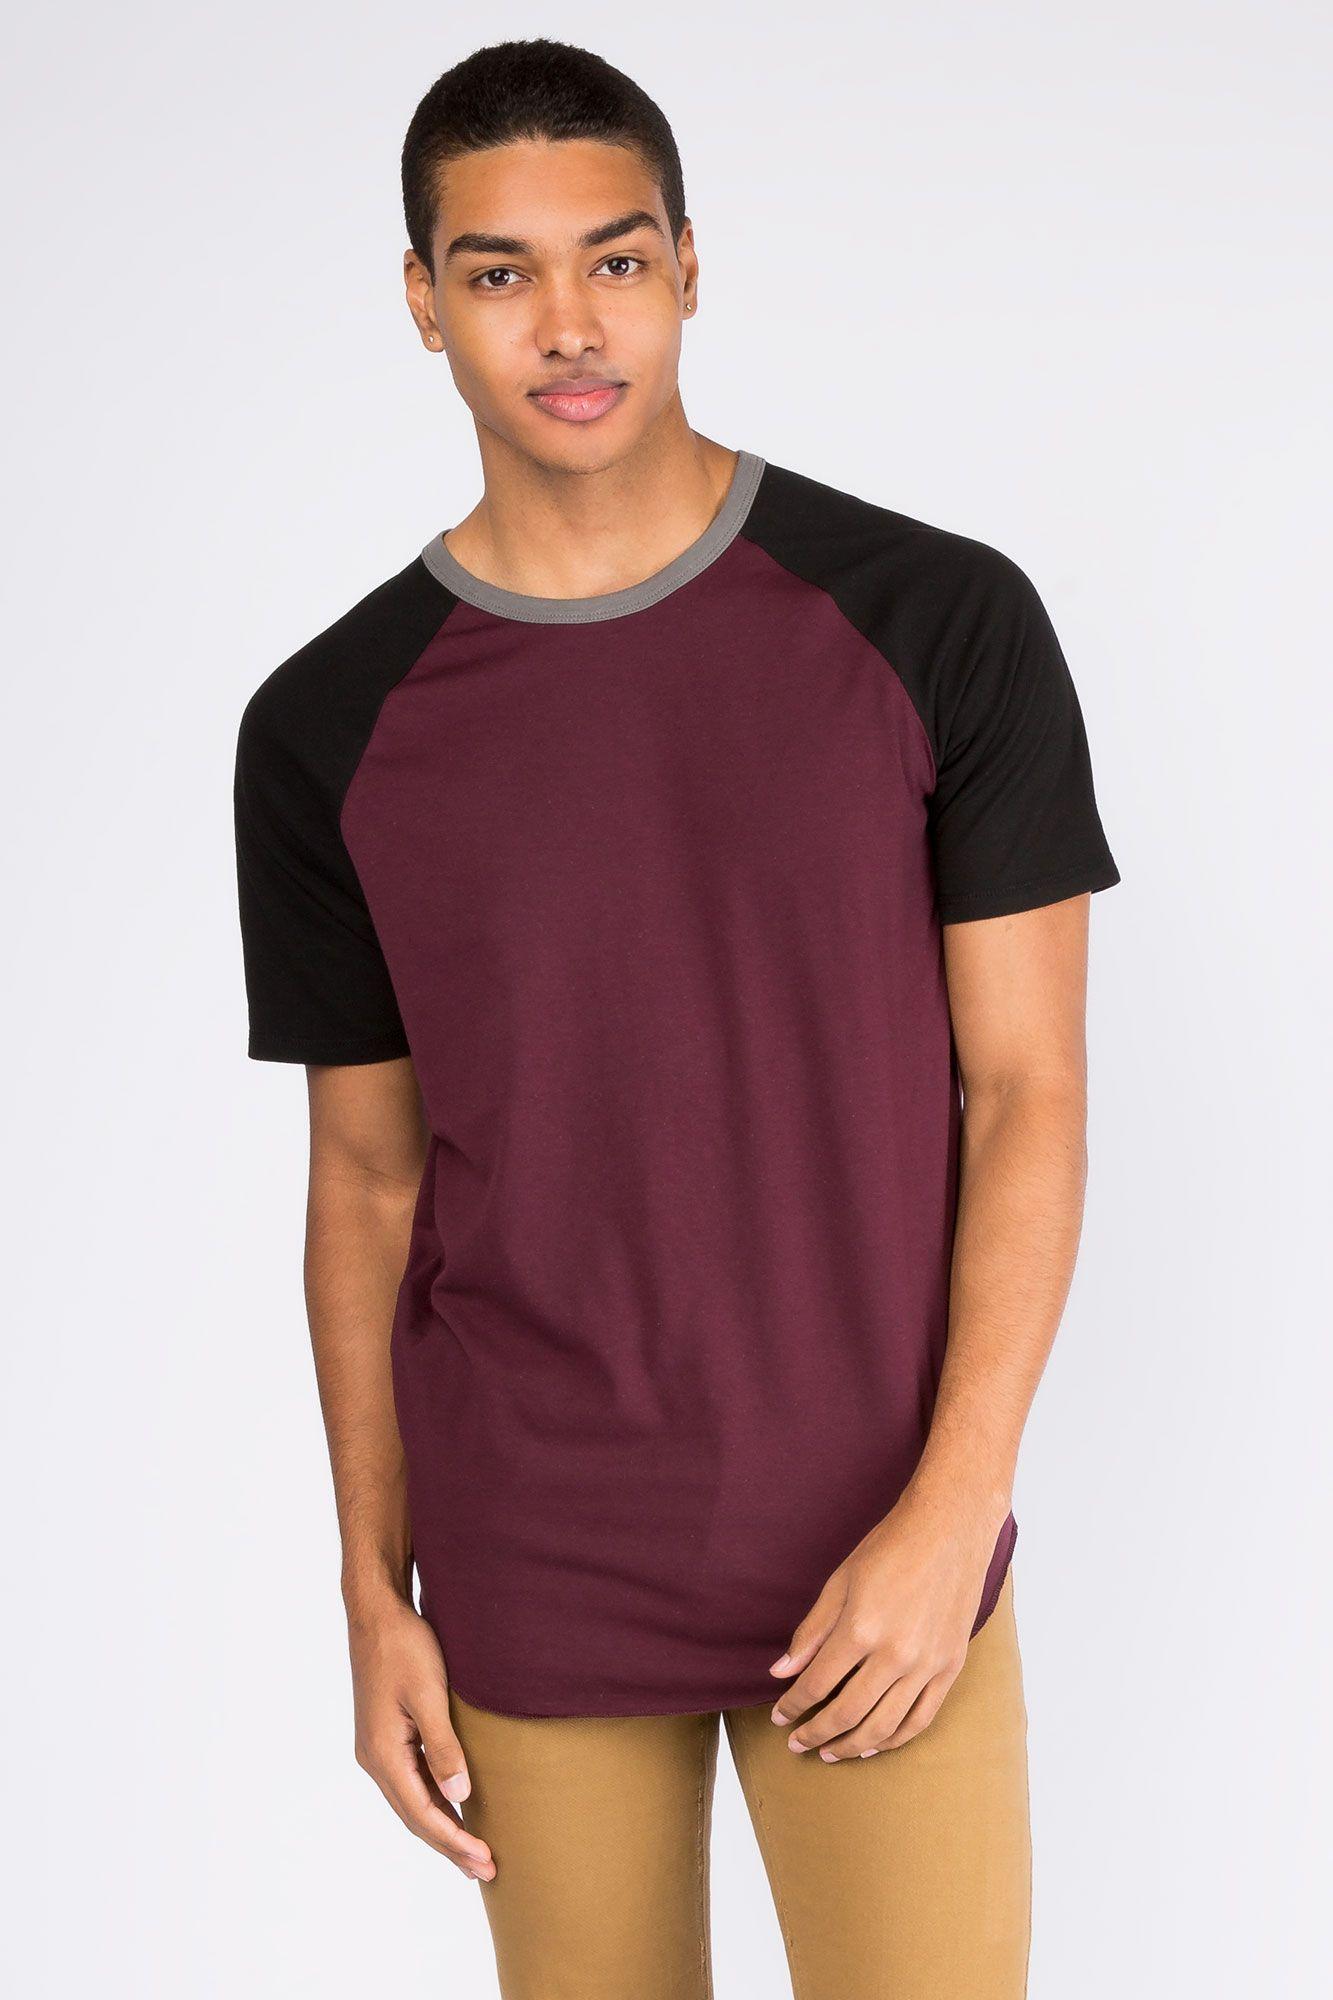 Guys S/S Raglan Colour Black knit